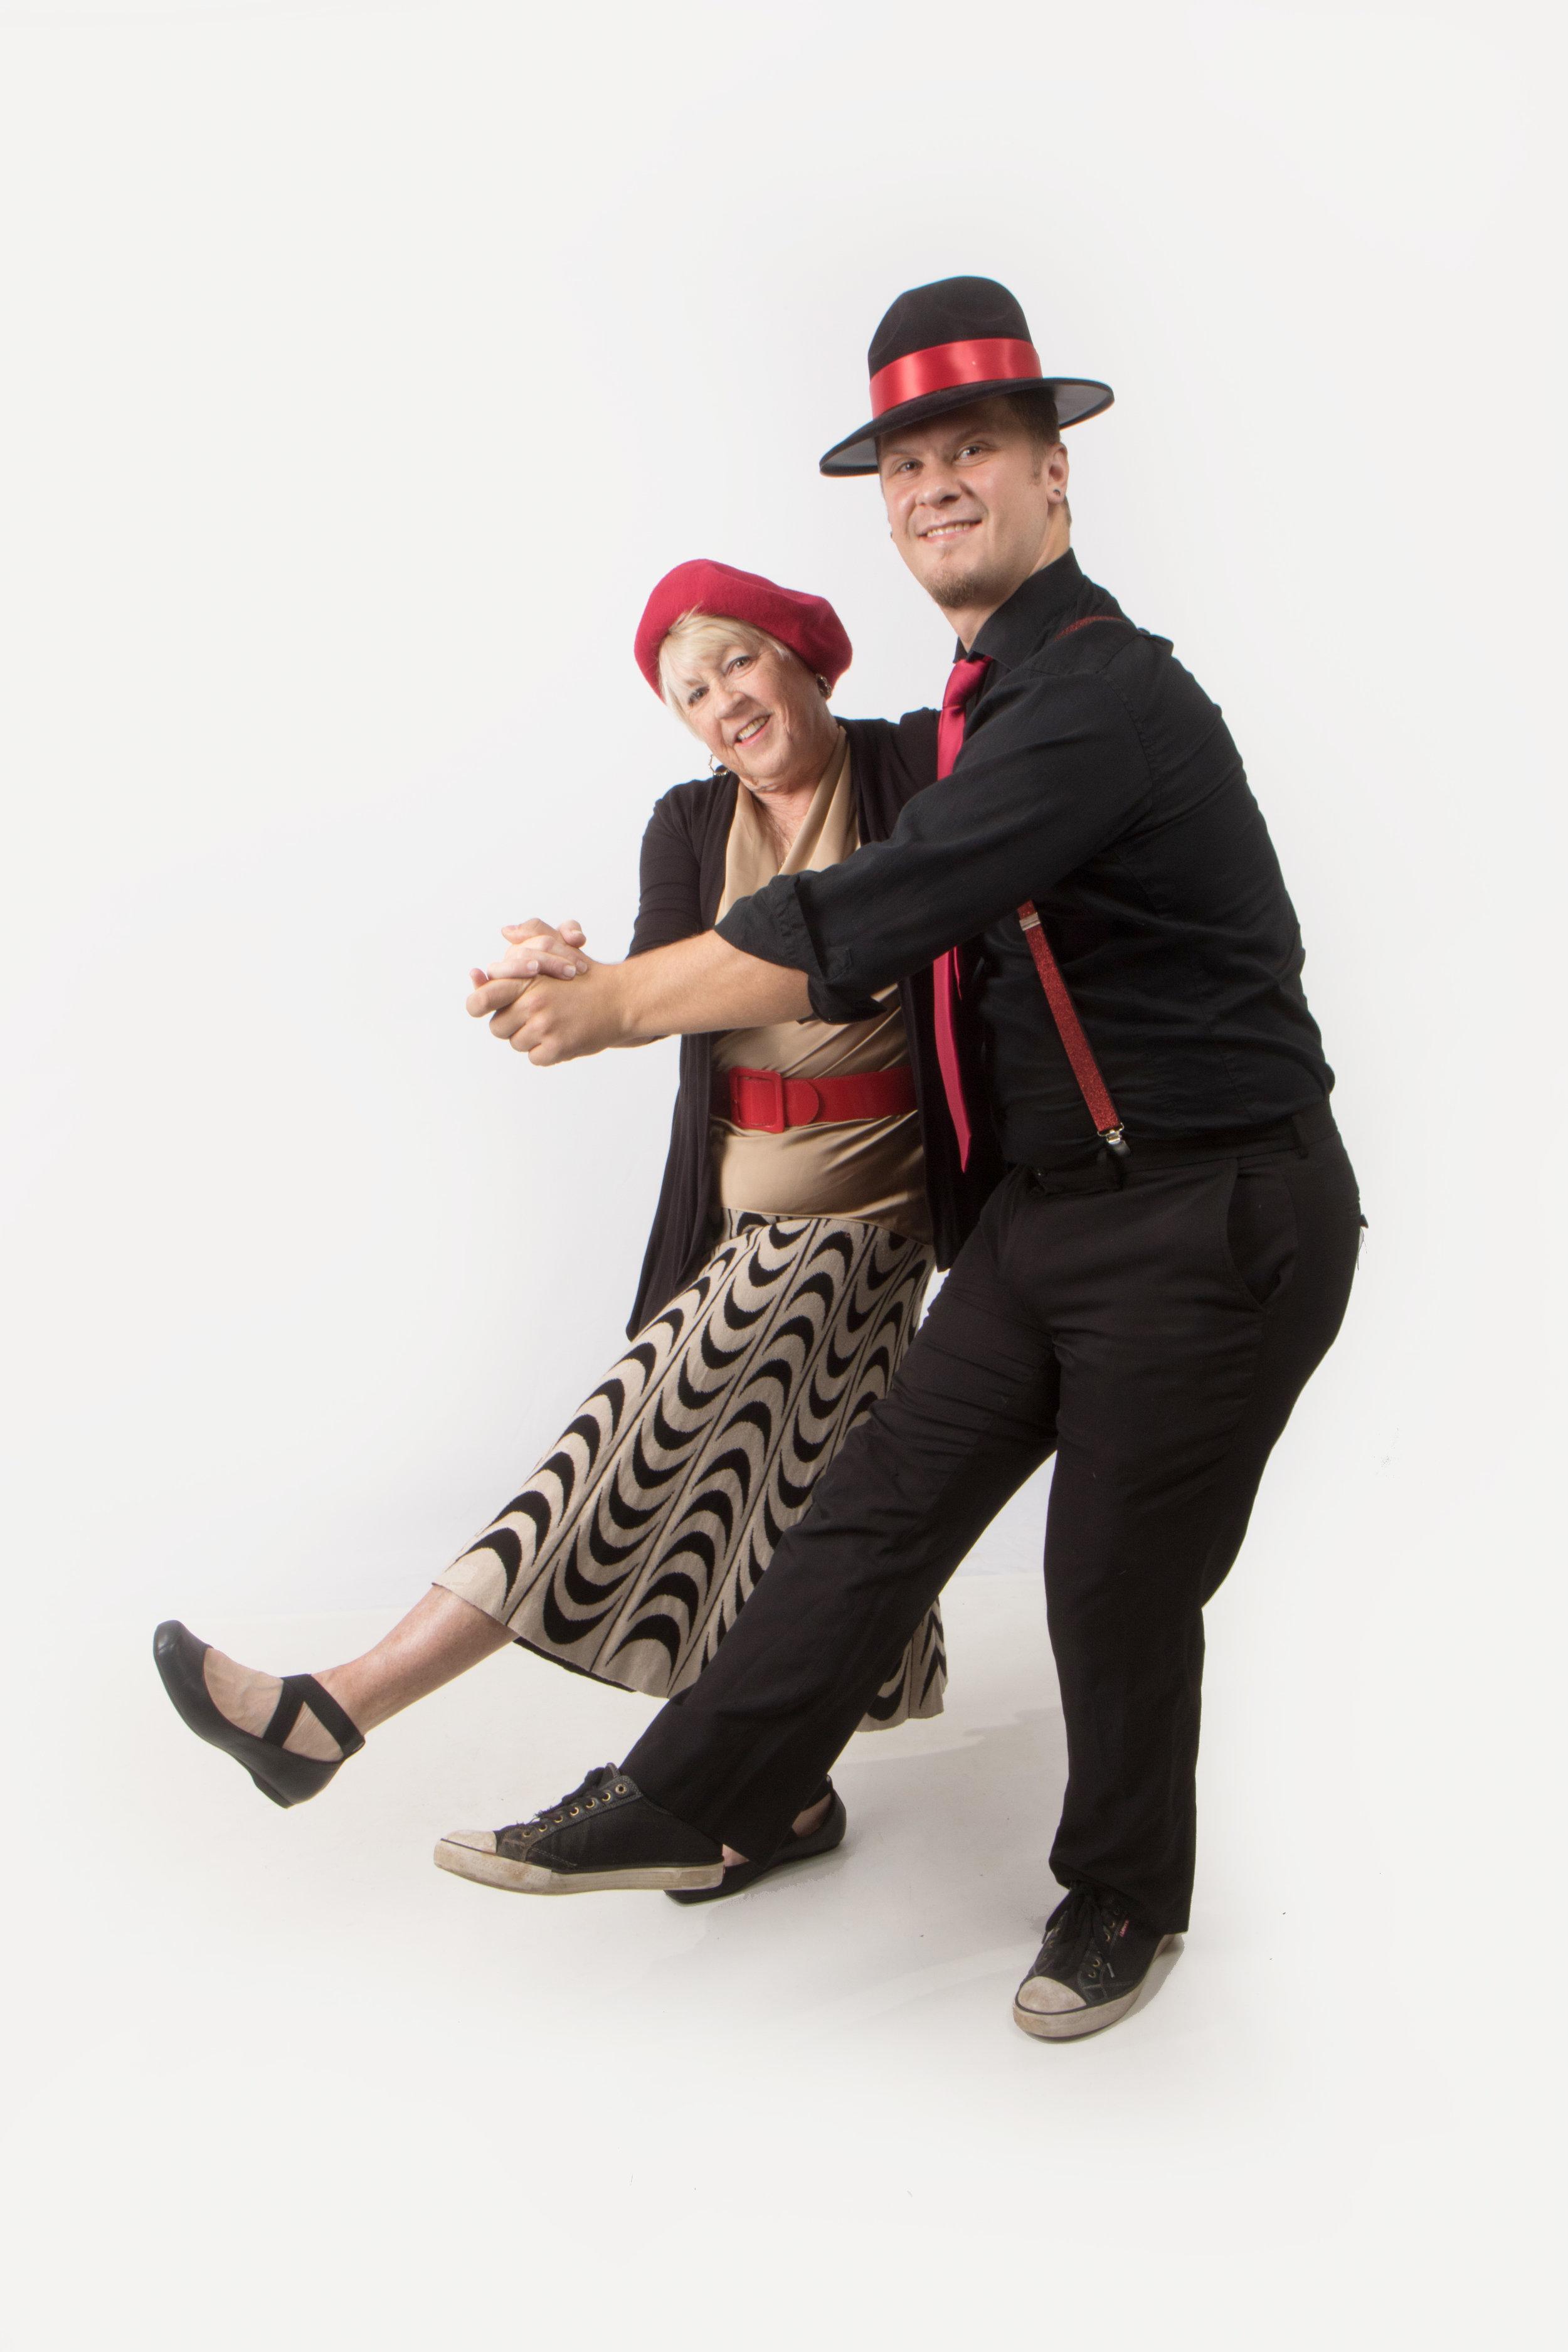 ELLEN DOYLE & JAY RHEA.jpg